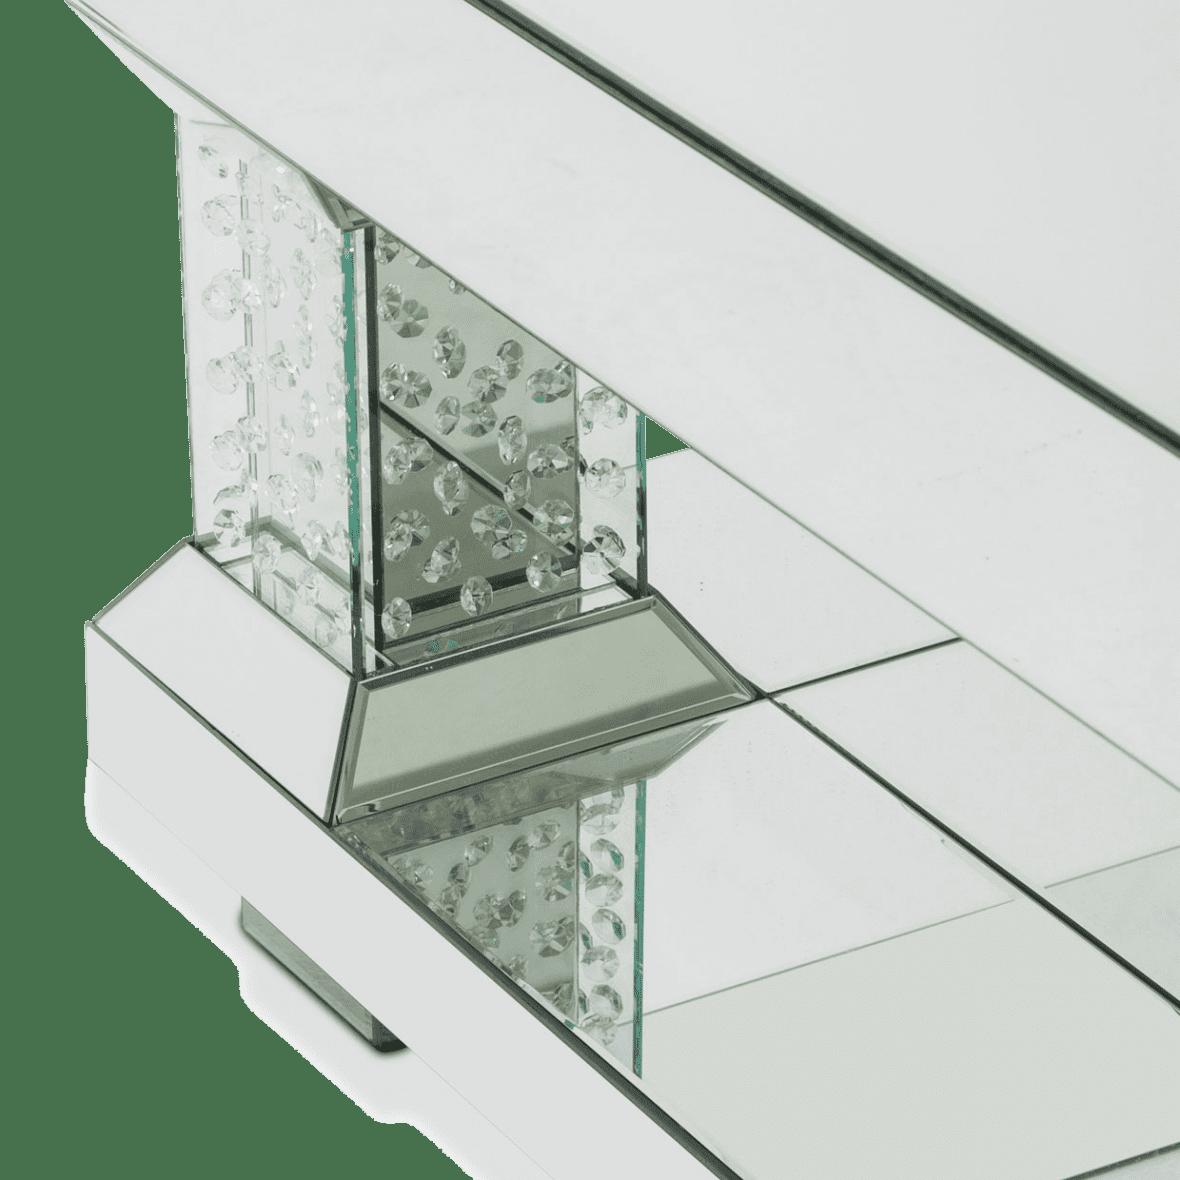 Зеркальный  журнальный стол с хрустальными акцентами